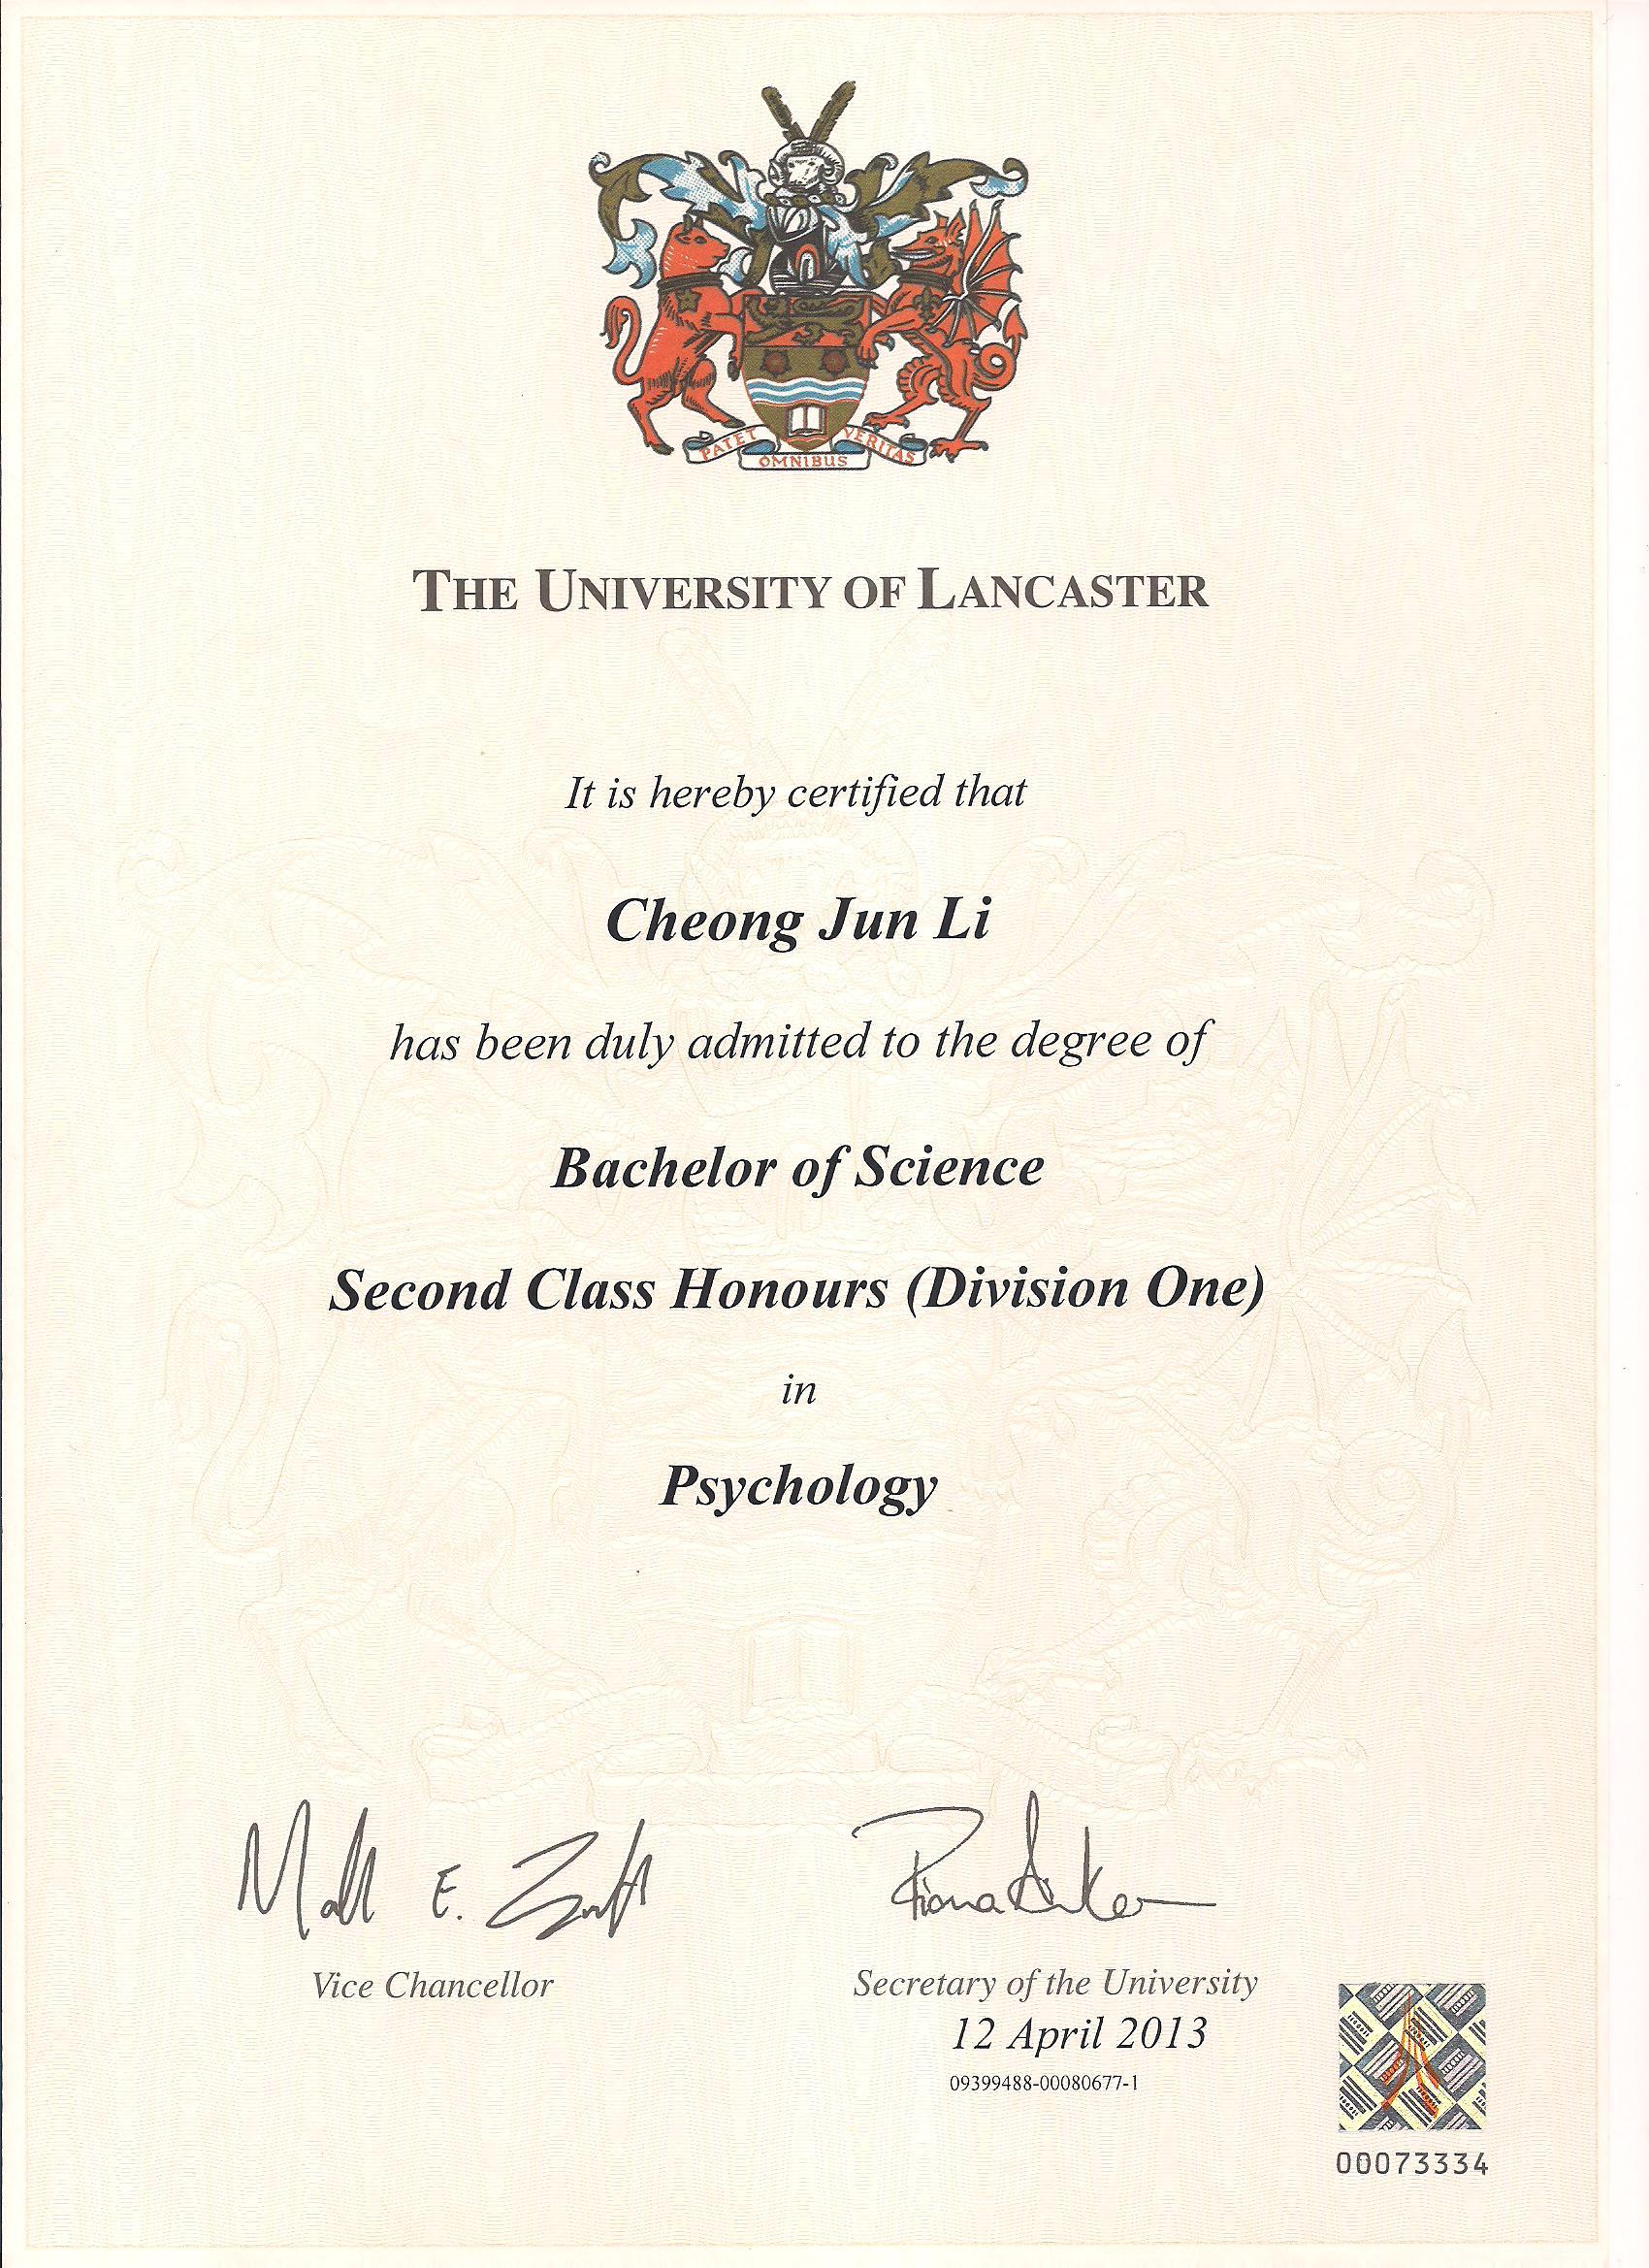 team cheong jun li oikos counseling lancaster university